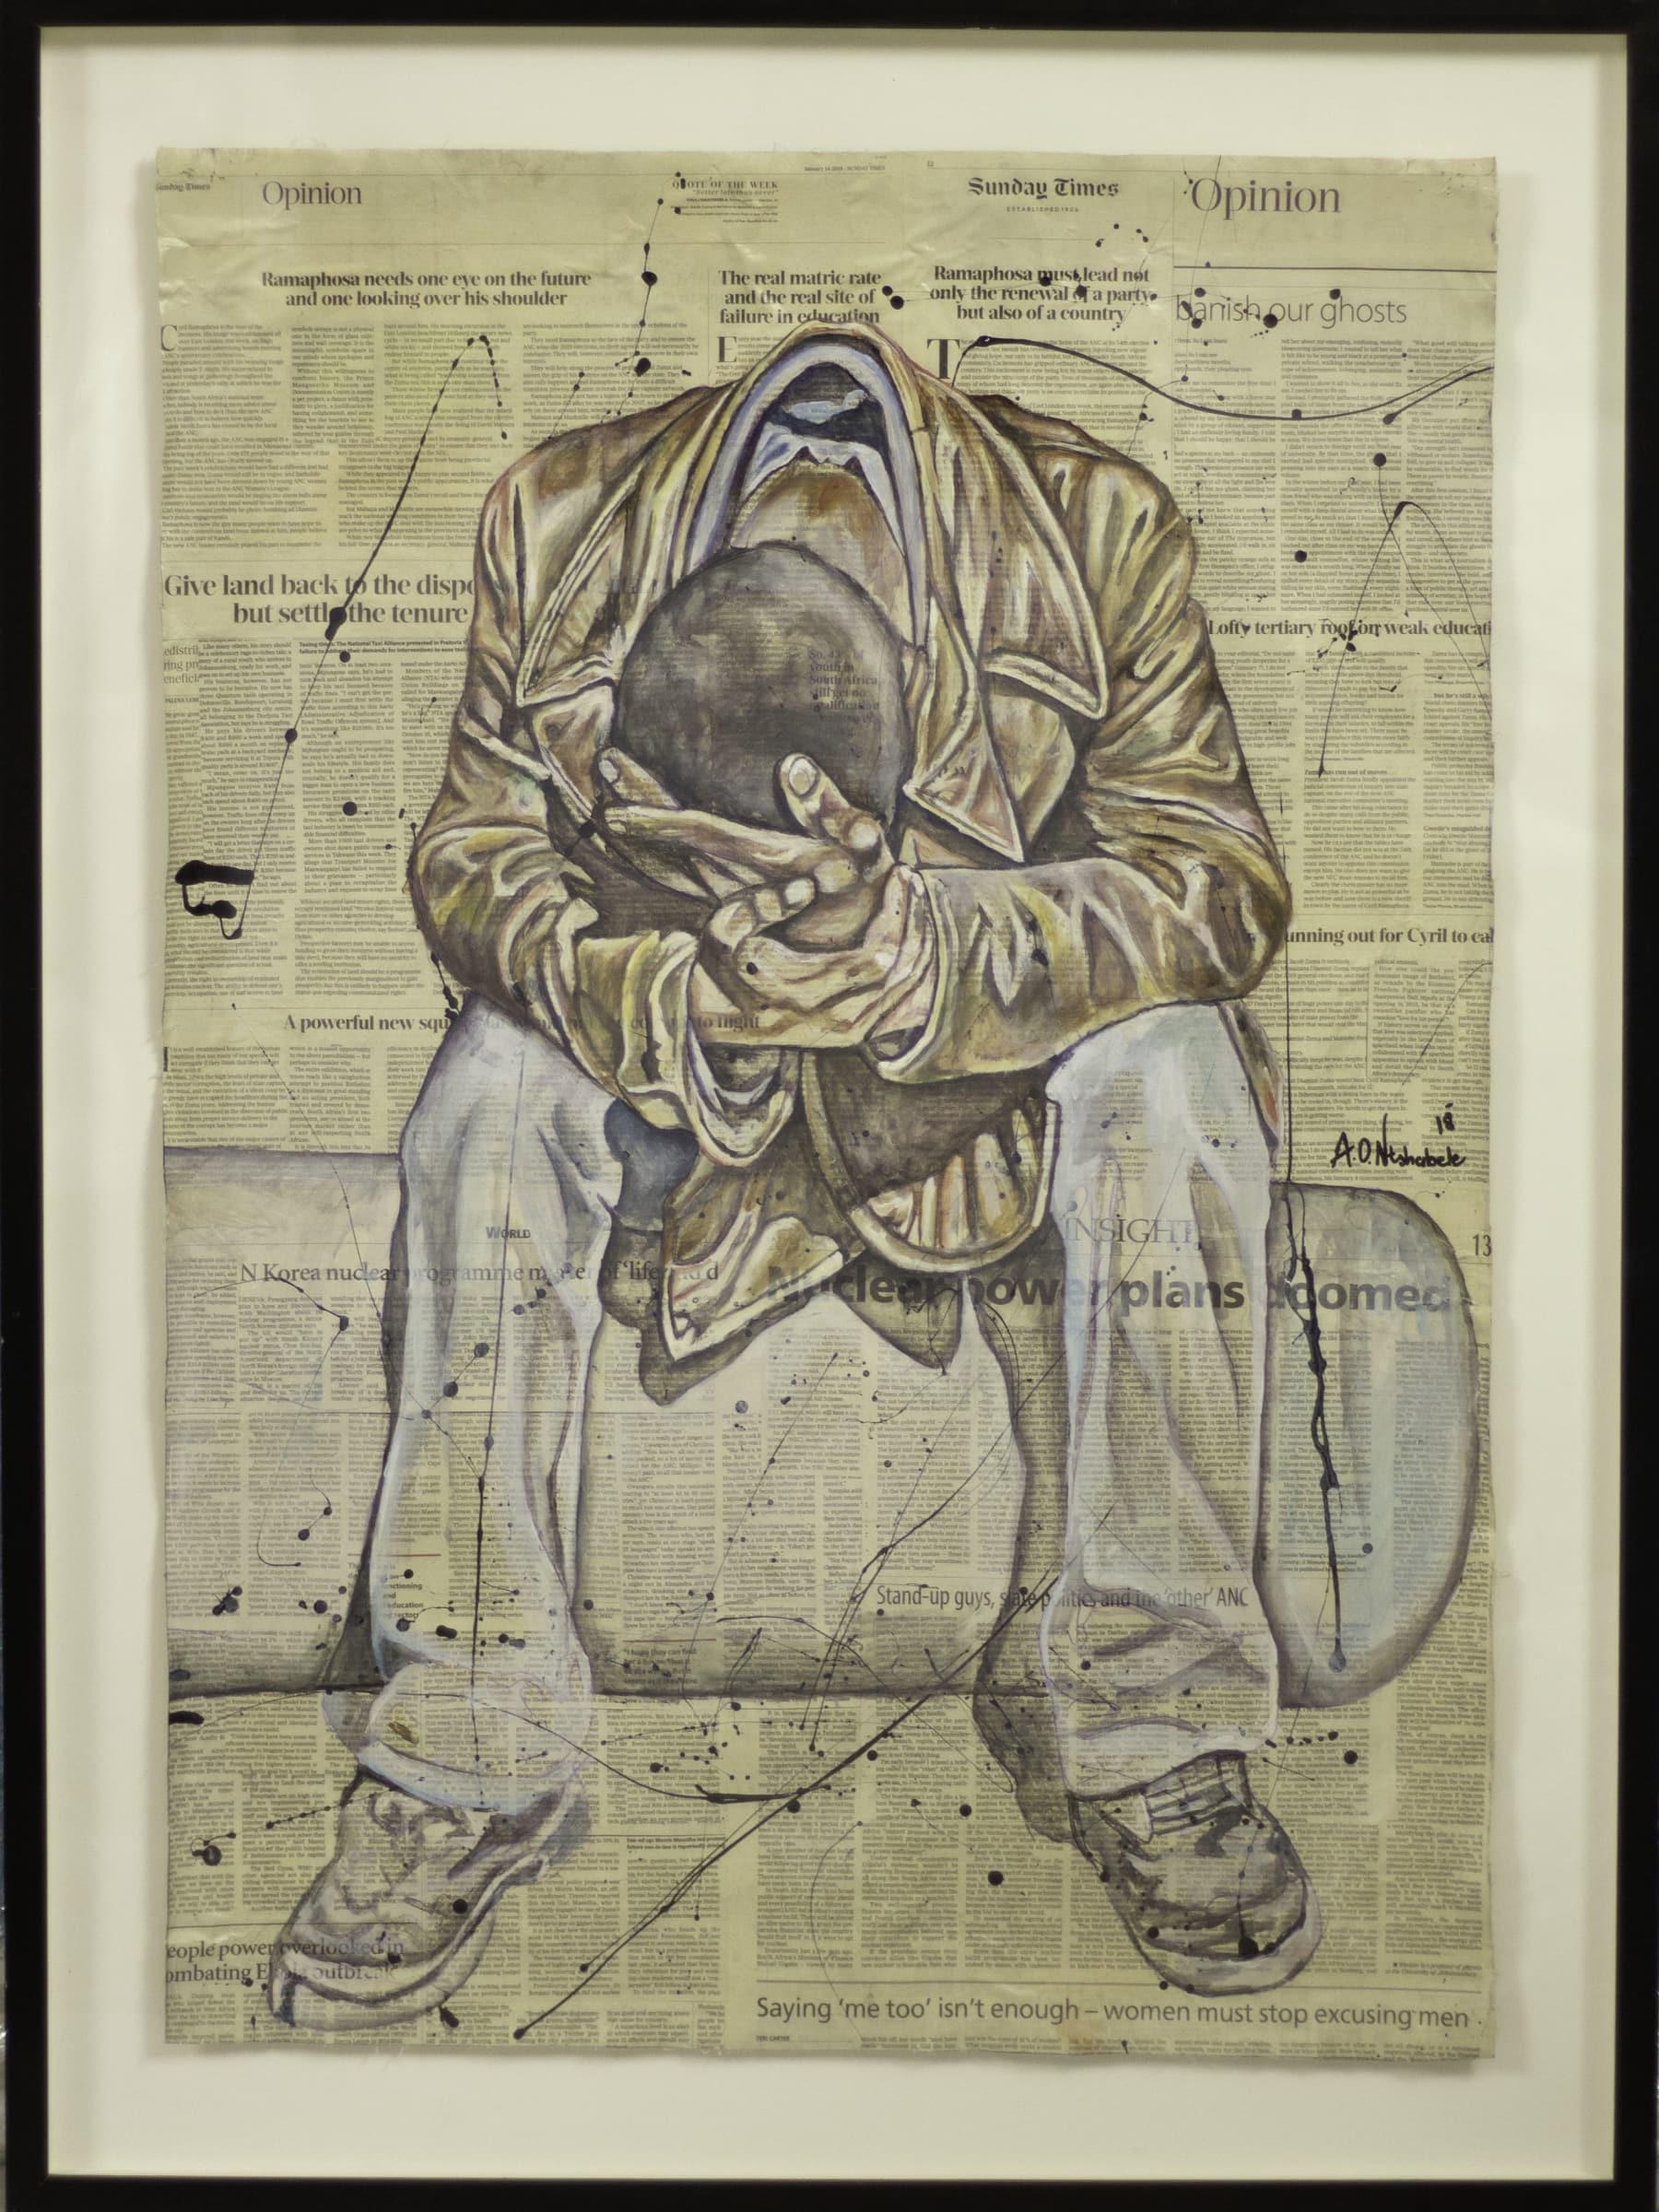 <span class=&#34;link fancybox-details-link&#34;><a href=&#34;/artworks/3075-andrew-ntshabele-contemplation-2018/&#34;>View Detail Page</a></span><div class=&#34;artist&#34;><strong>Andrew Ntshabele</strong></div> <div class=&#34;title&#34;><em>Contemplation</em>, 2018</div> <div class=&#34;medium&#34;>Acrylic & Enamel On Newspaper</div> <div class=&#34;dimensions&#34;>99.5cm x 69.6cm (86.6cm x 116.3cm framed)</div><div class=&#34;price&#34;>R11,555.00</div>